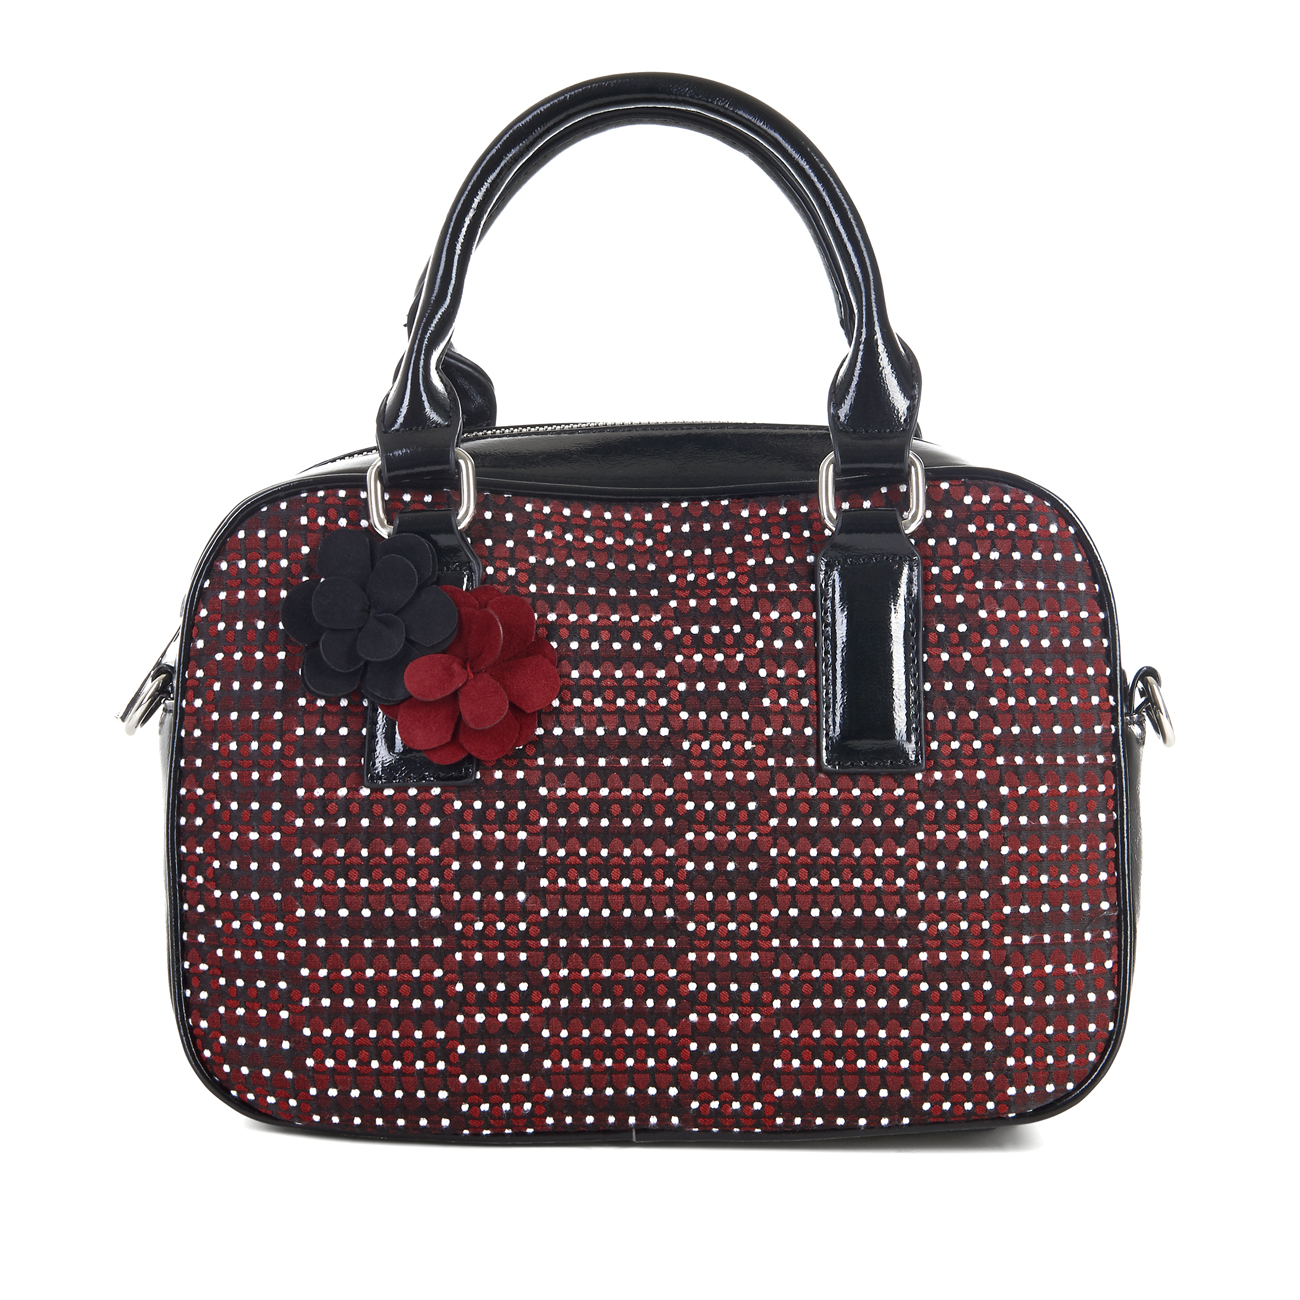 Ruby Shoo Large Seoul Bowling Bag Black Red Freya